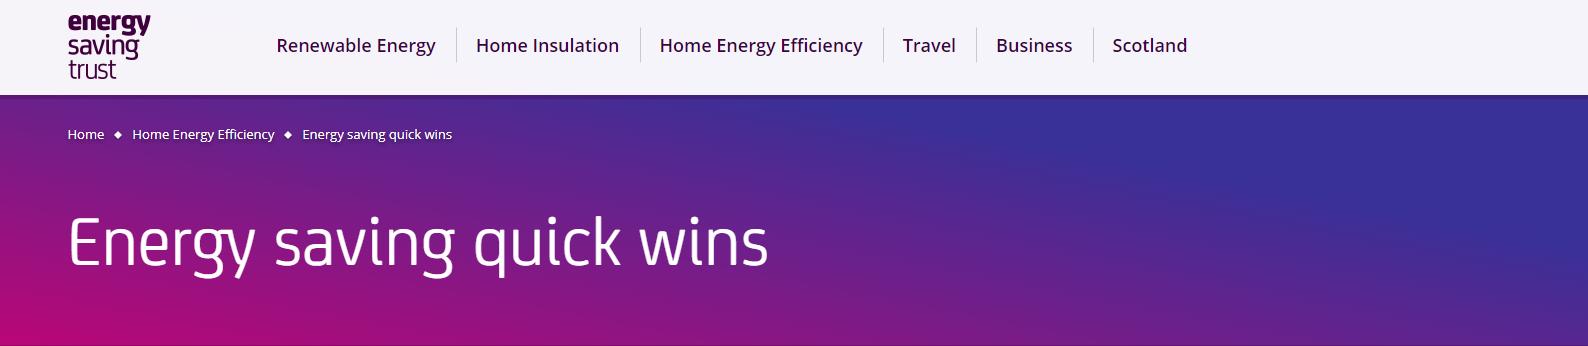 Energy-saving-trust-website.PNG